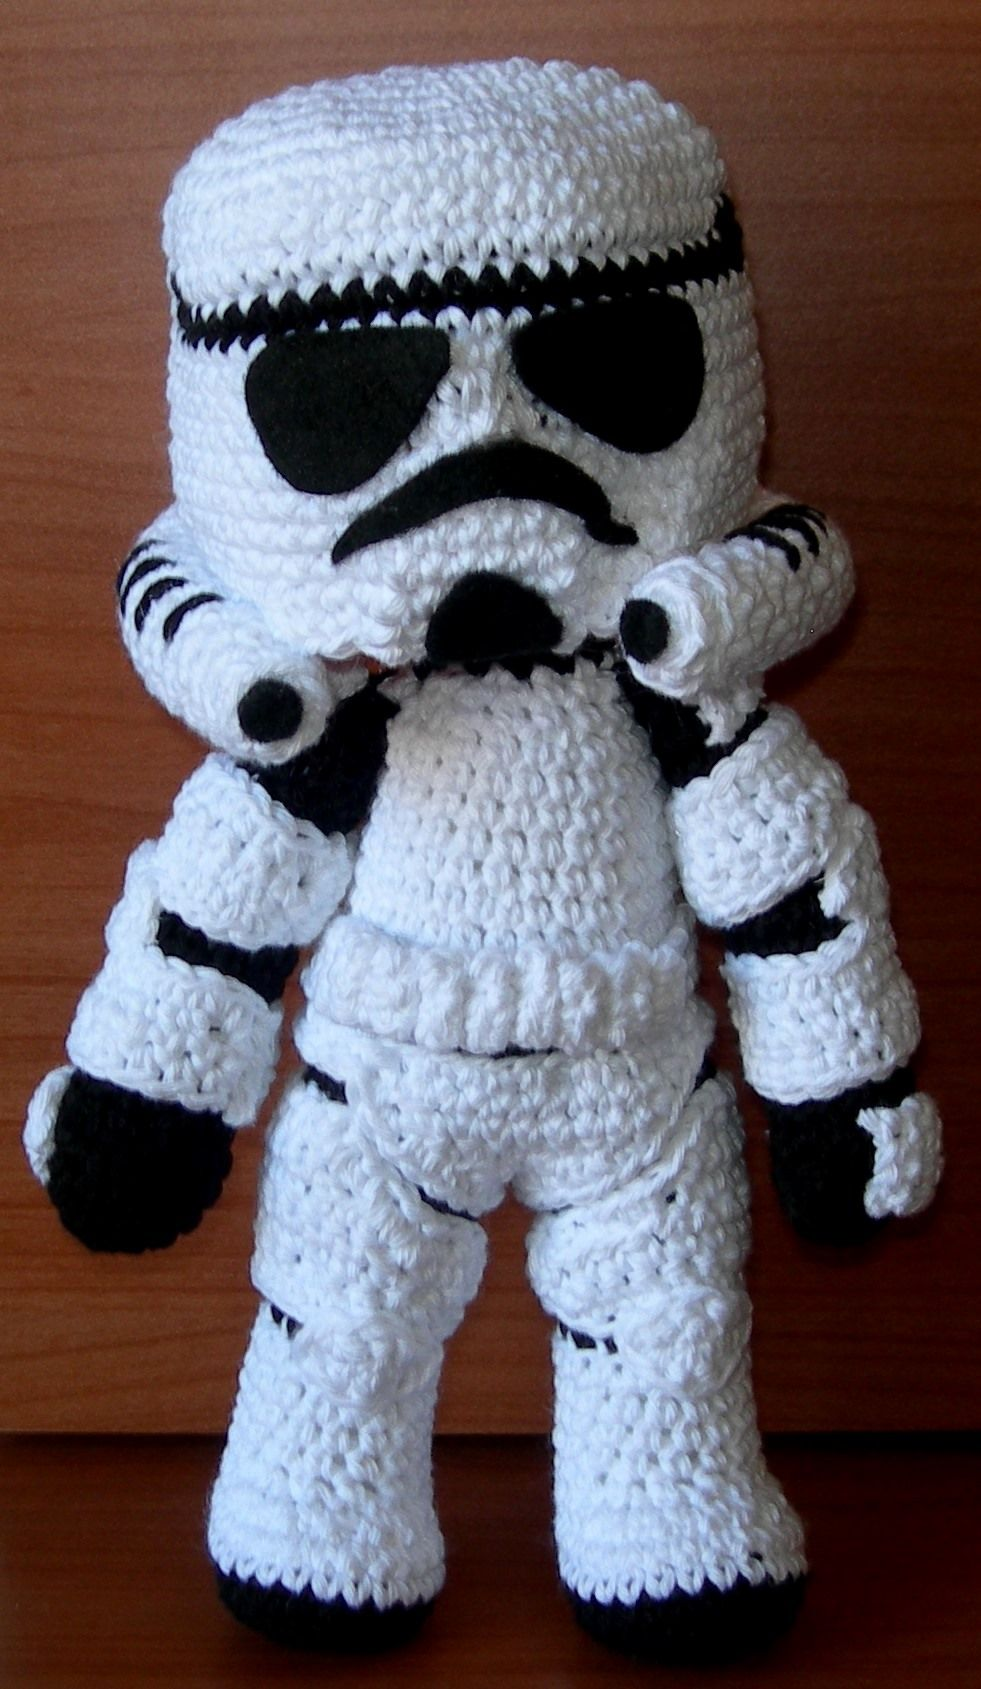 Stormtrooper amigurumi | mari | Pinterest | Patrones amigurumi ...